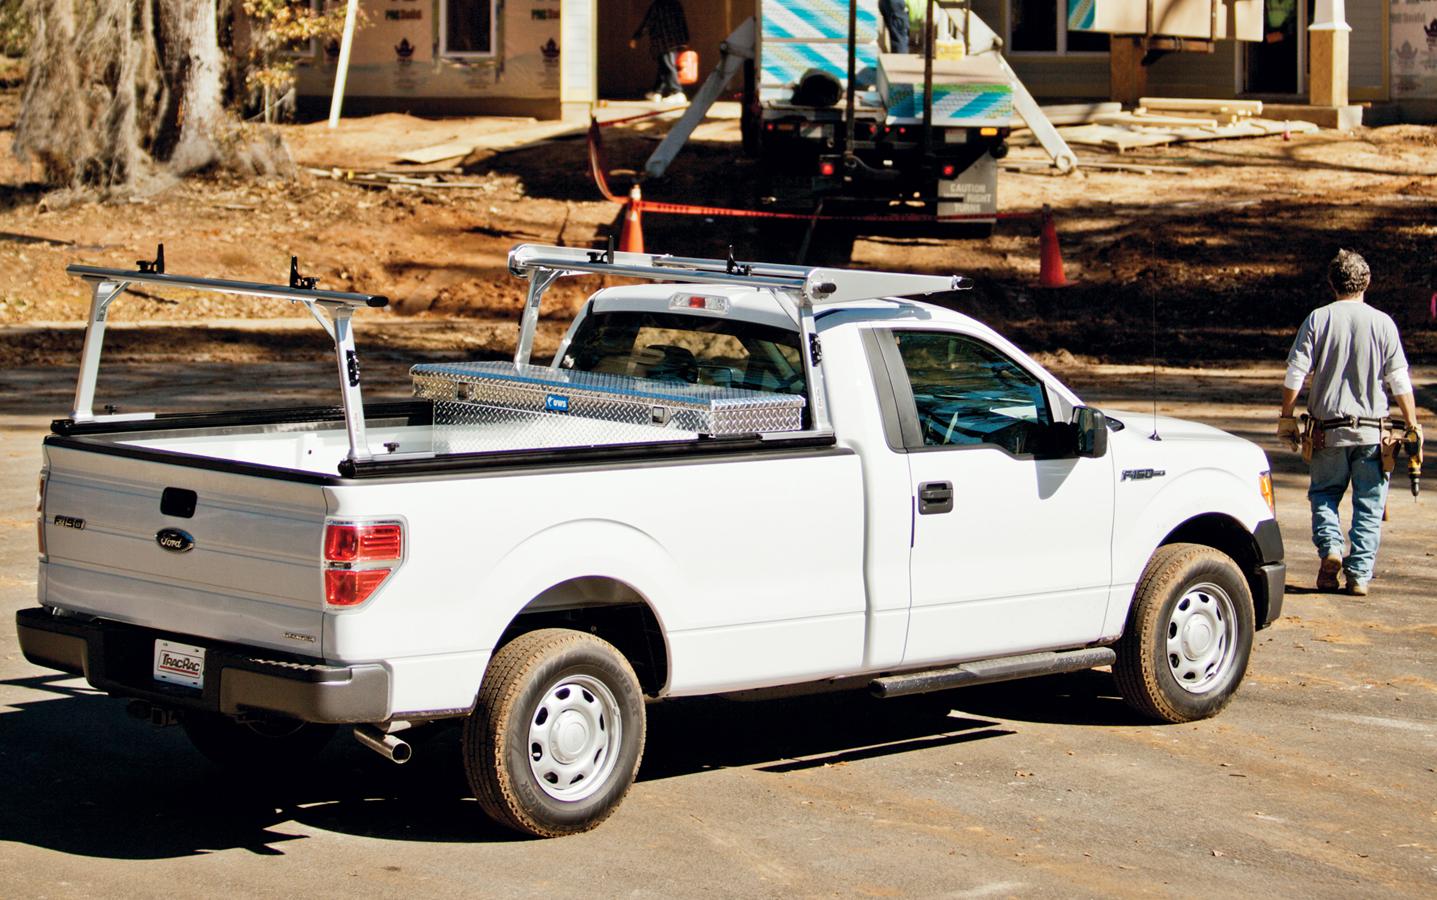 Tracrac Sr Truck Rack Free Shipping Amp Price Match Guarantee